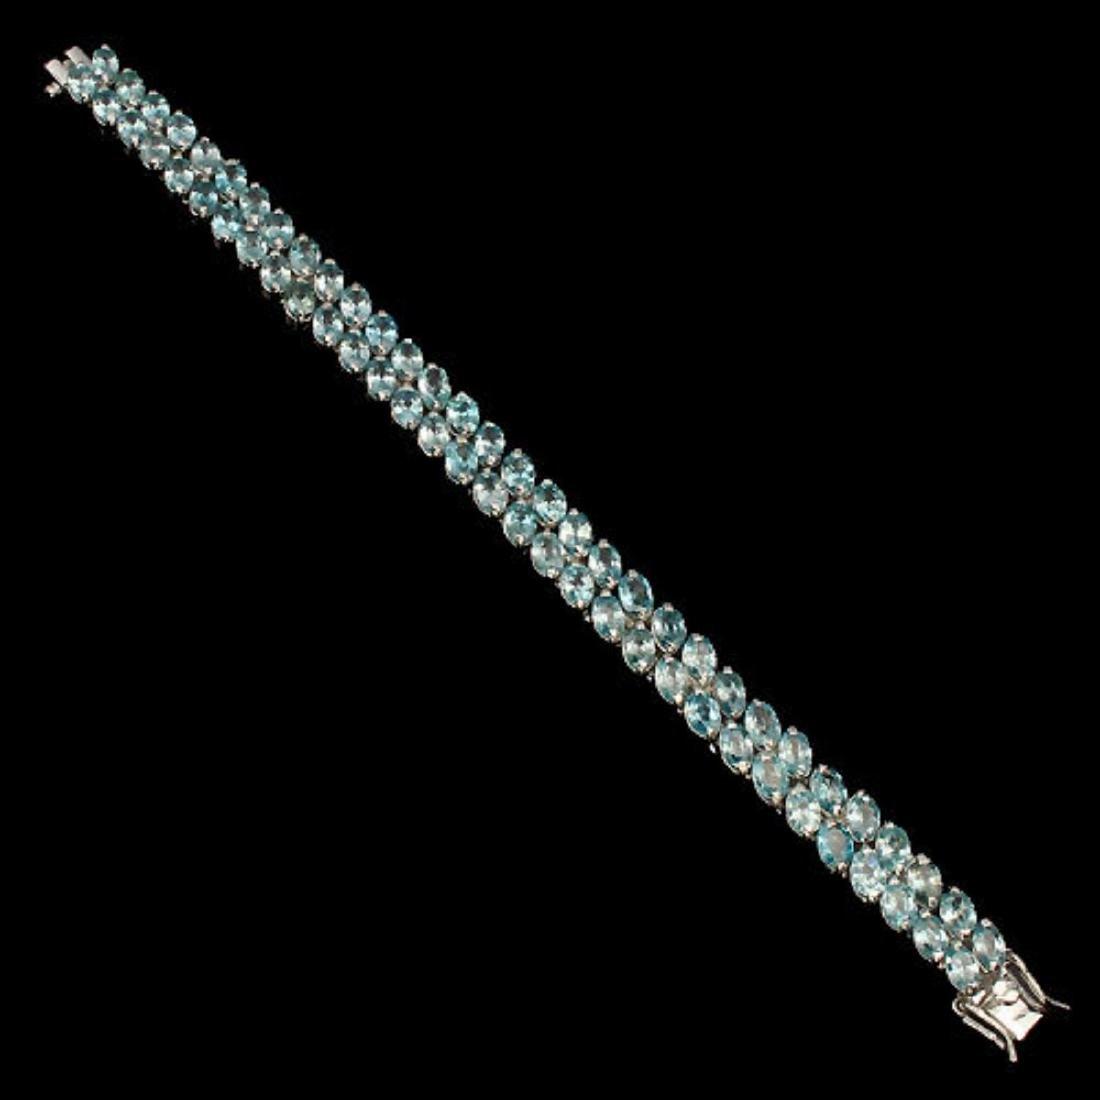 Nautral Combodian Zircon 146 Carats Bracelet - 3